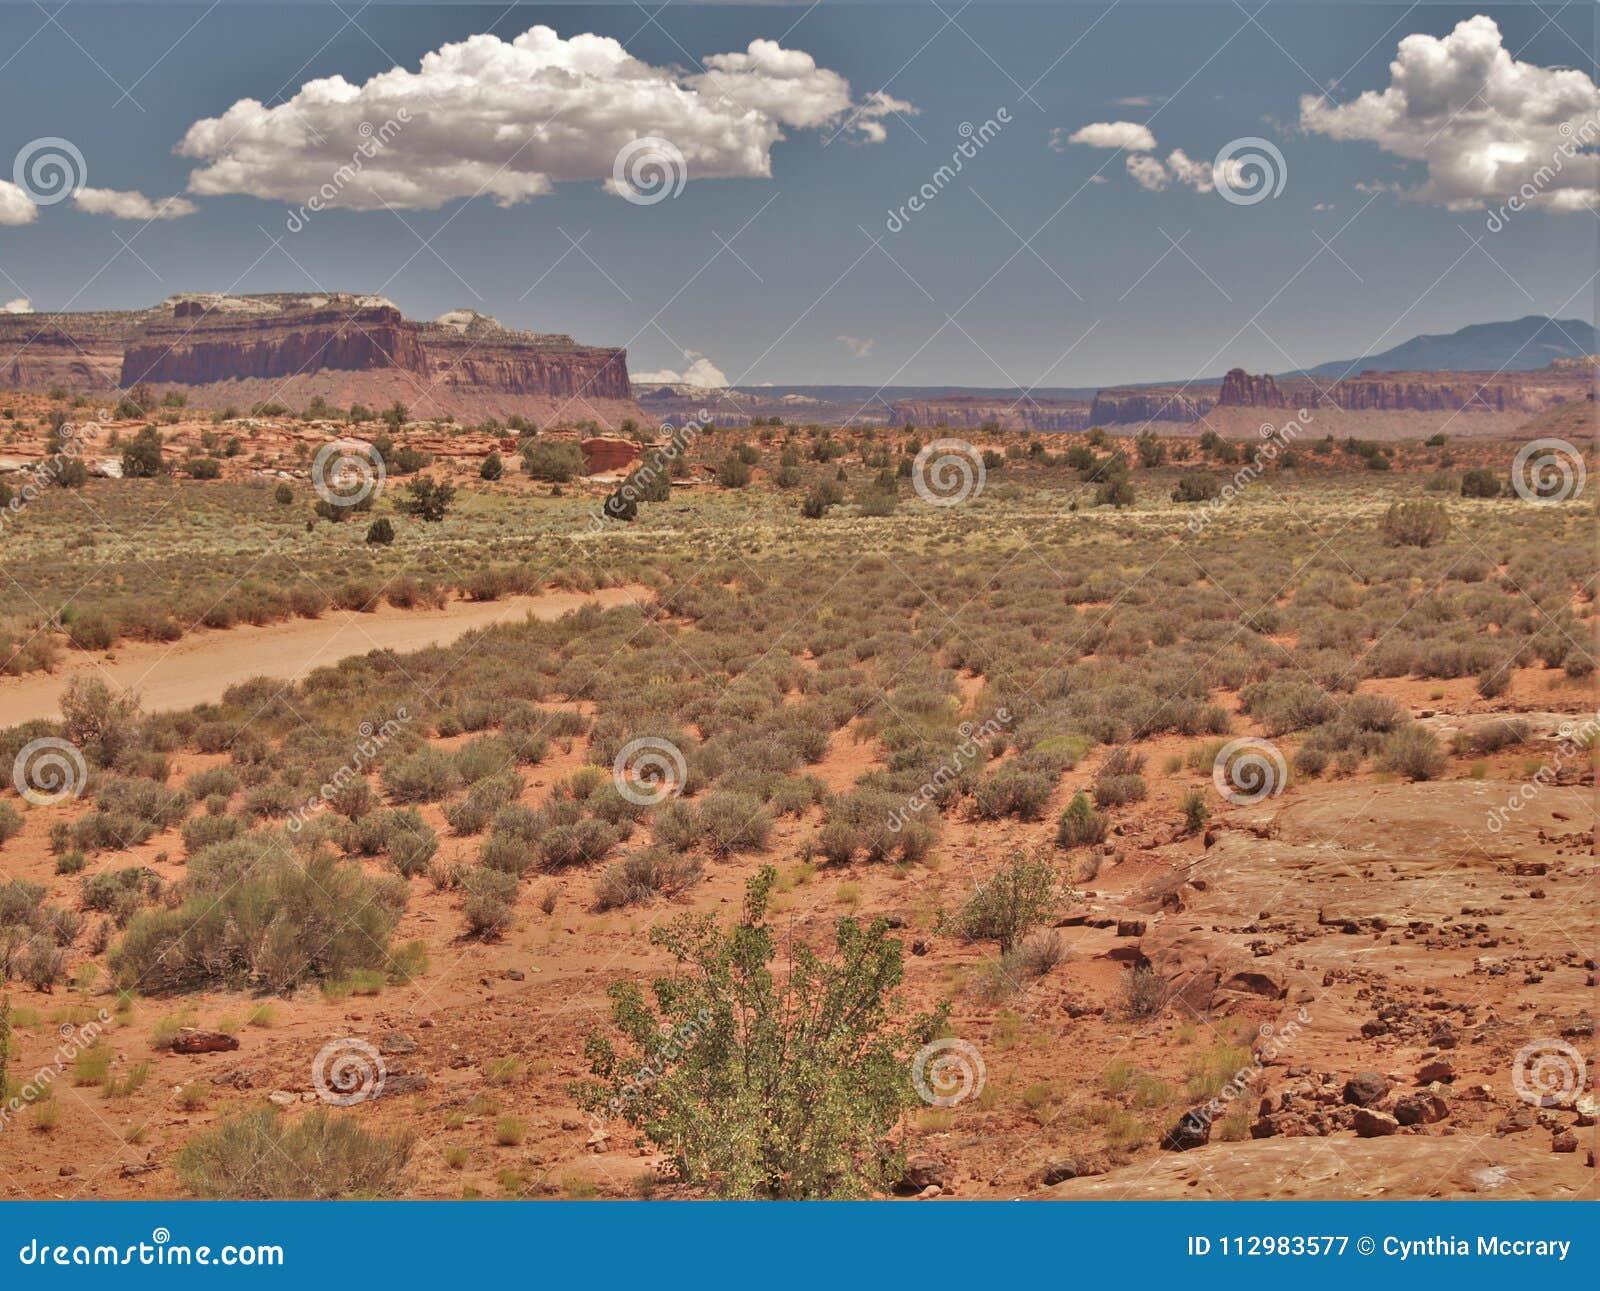 Canyon Rims Recreation Area in Utah